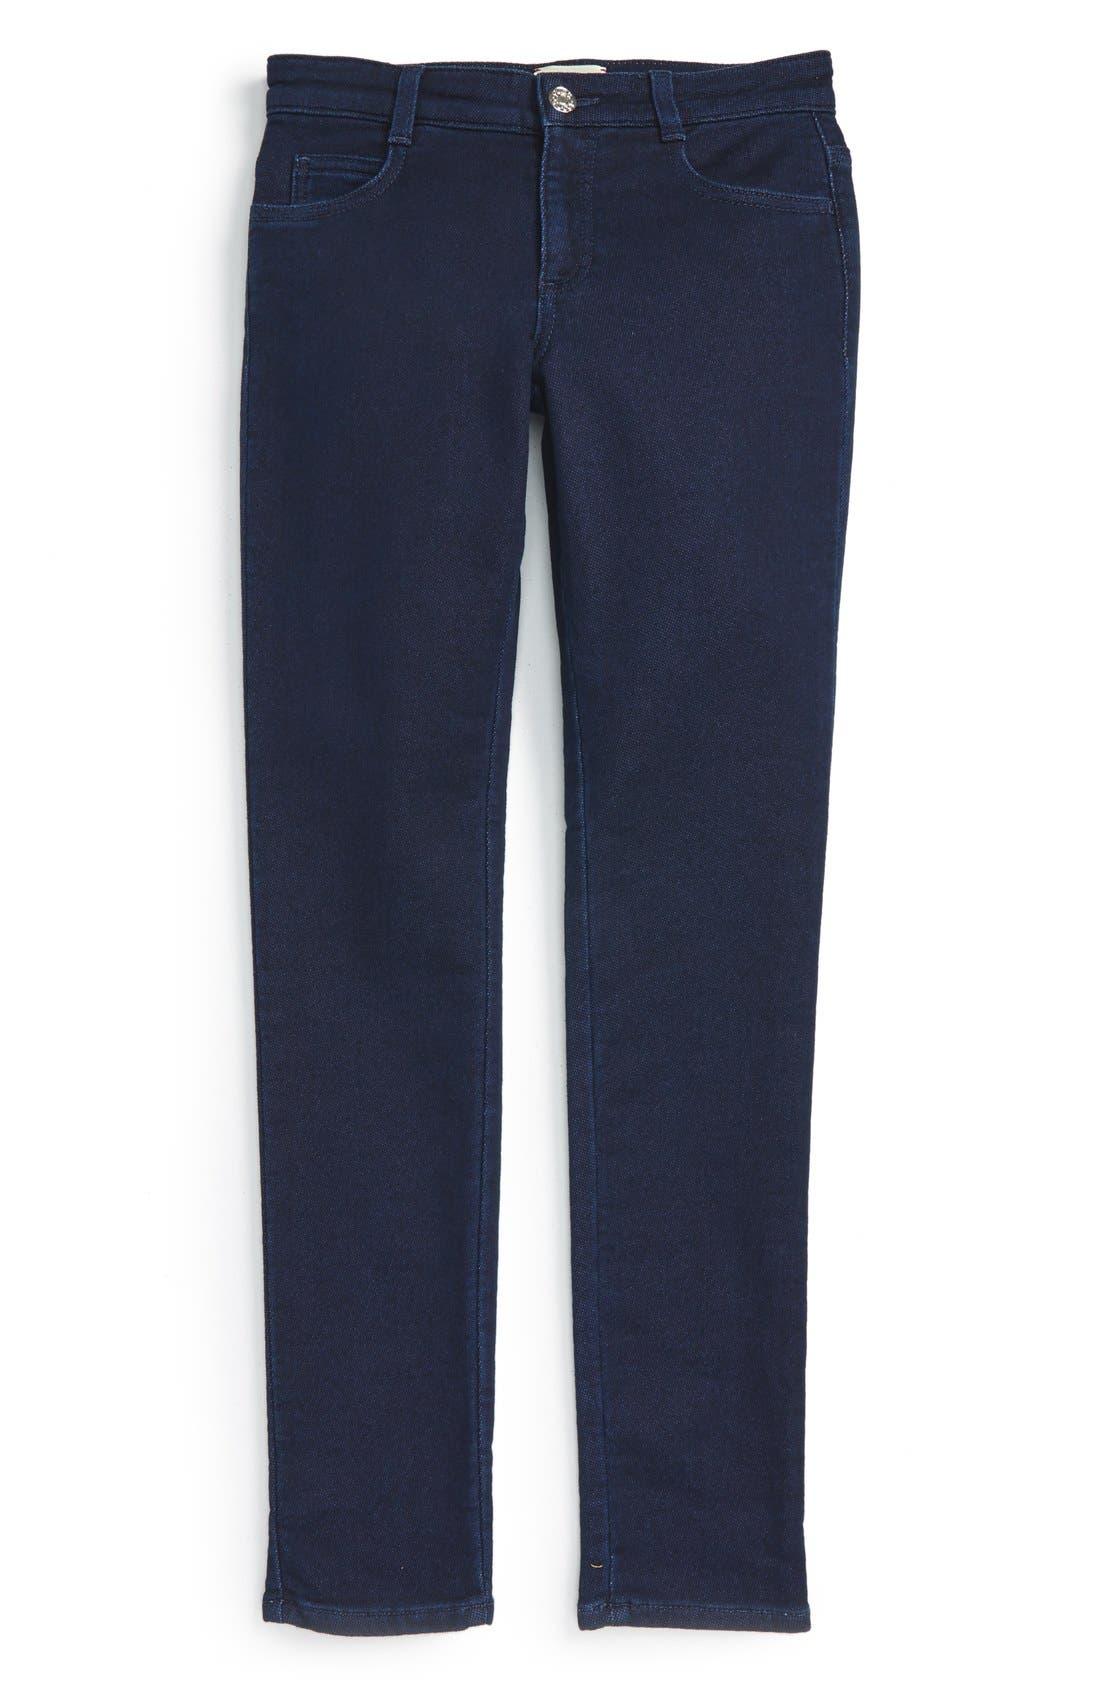 Main Image - Gucci Skinny Knit Pants (Little Girls & Big Girls)